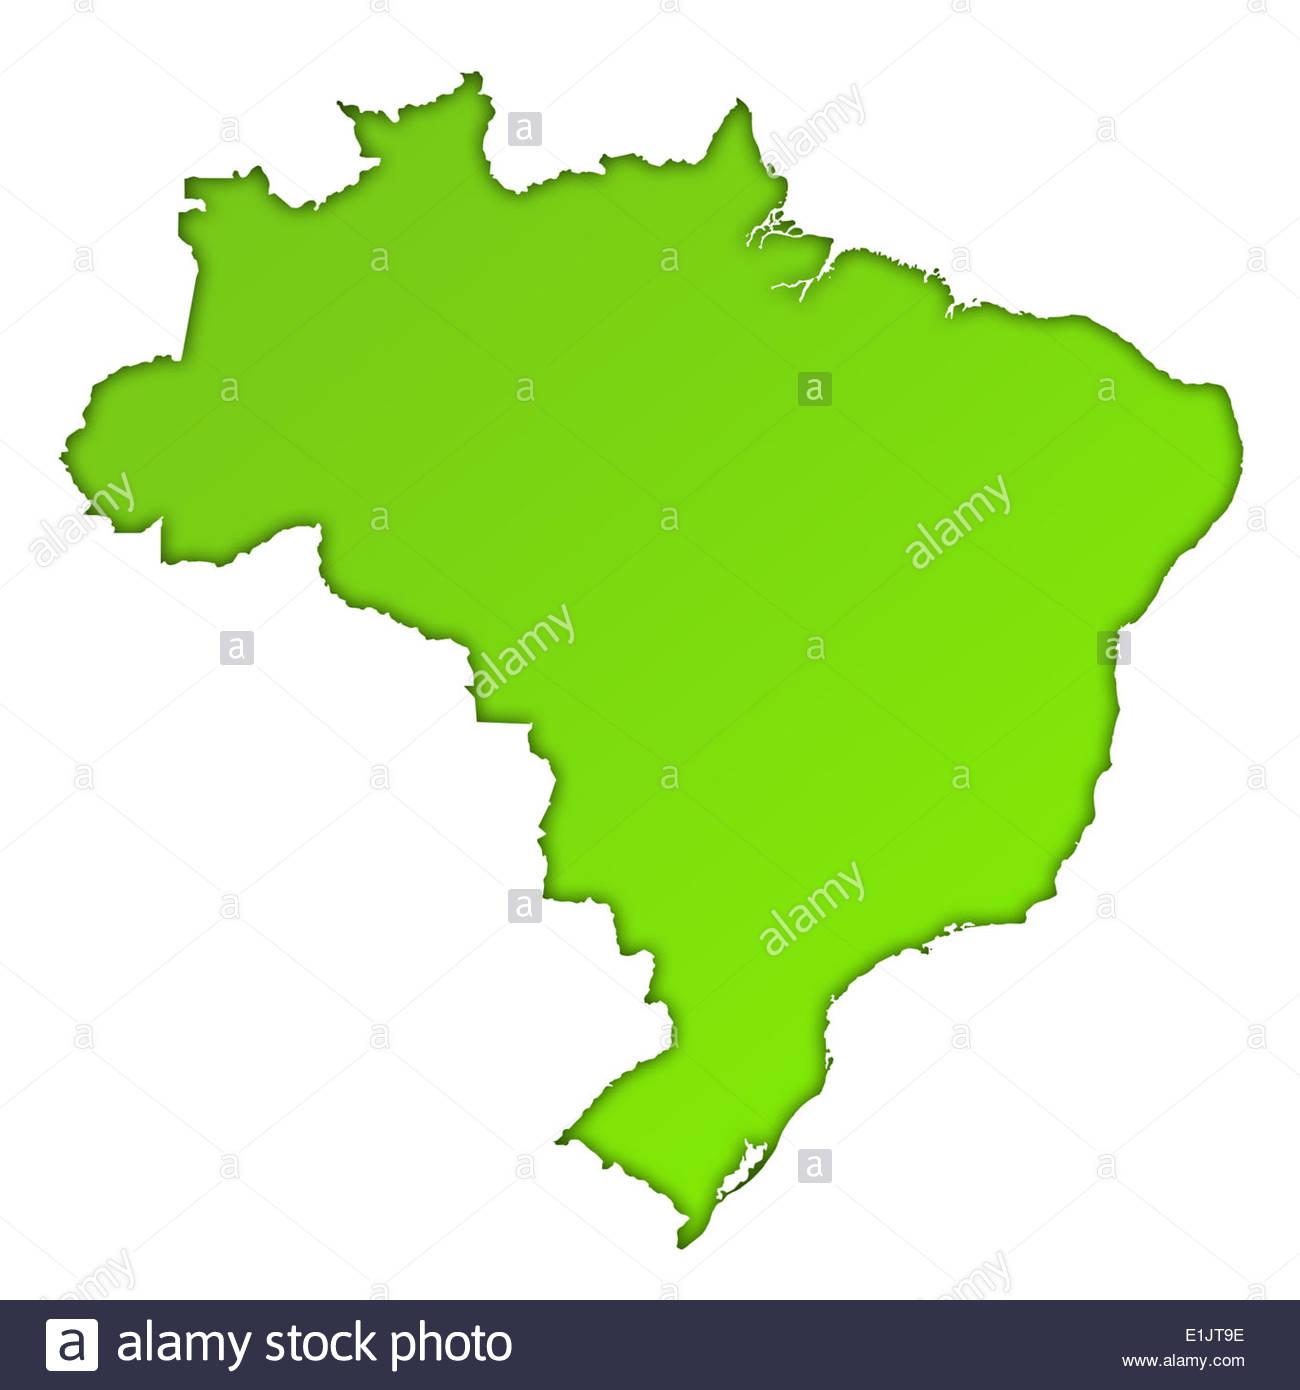 Brazil Map Stockfotos & Brazil Map Bilder - Alamy